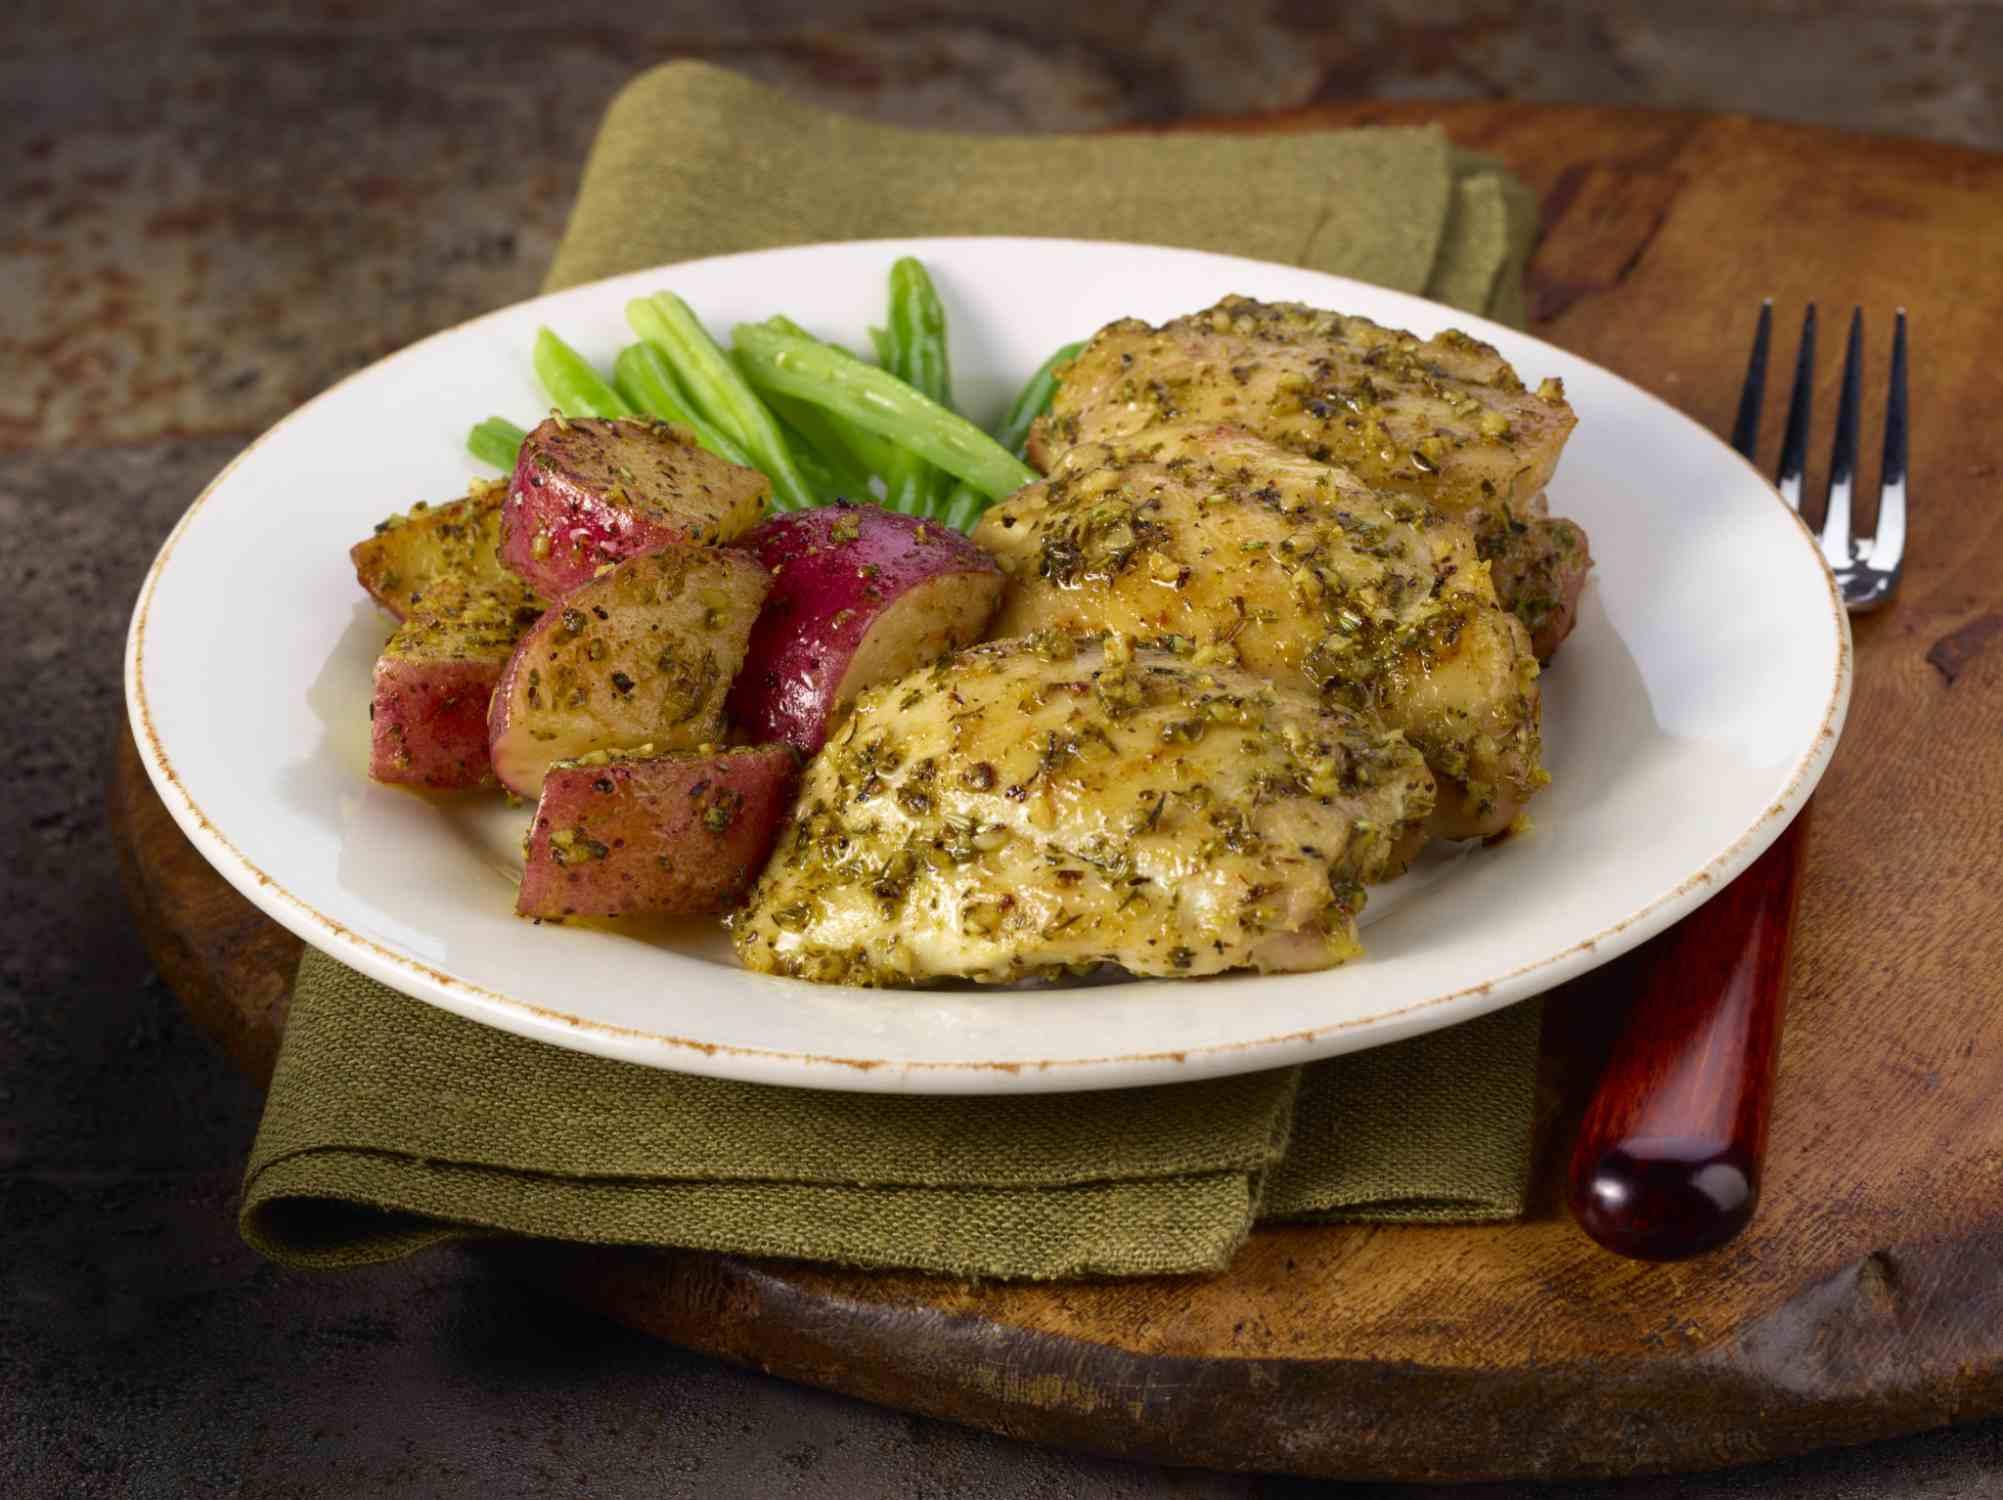 Chicken dinner on a plate